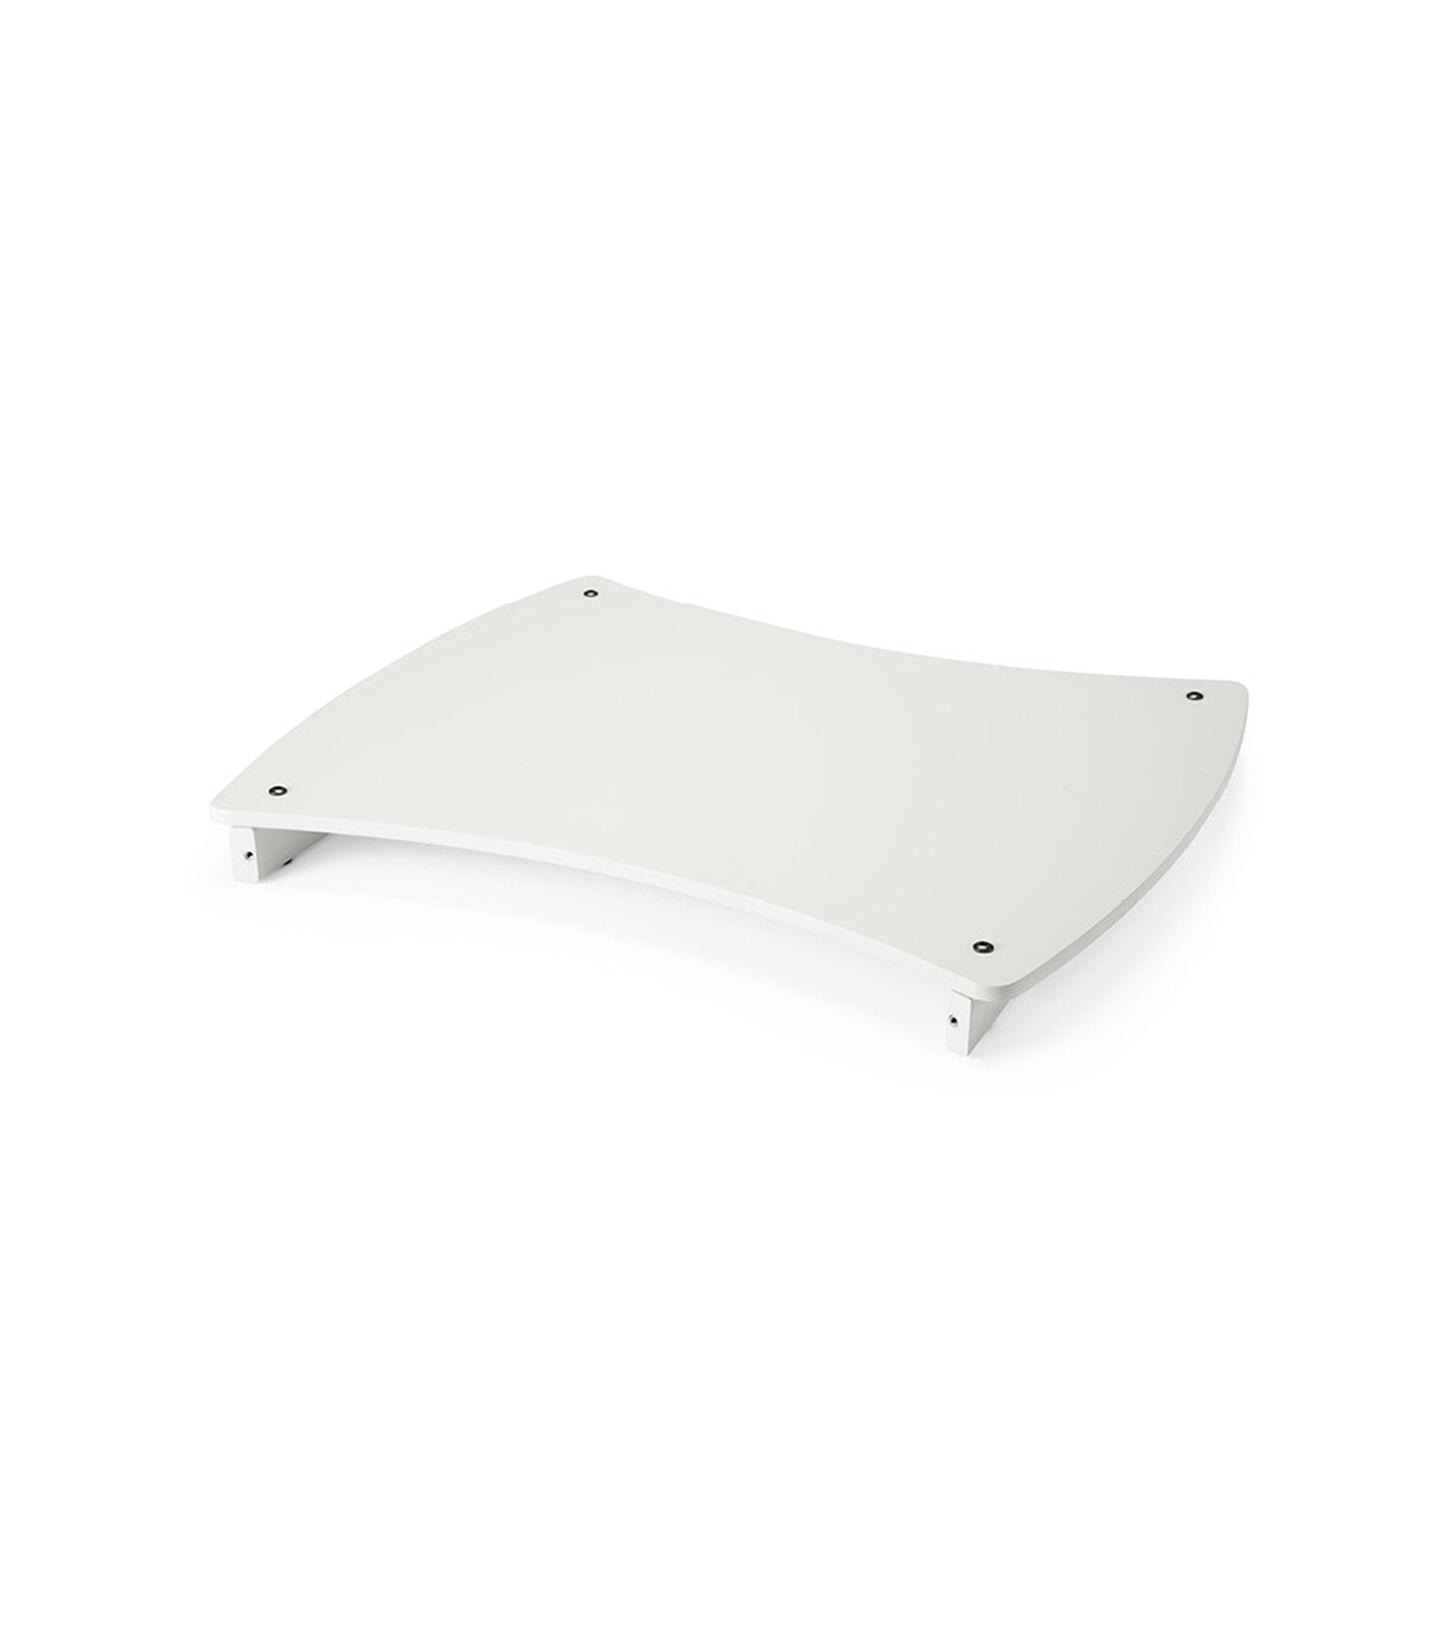 Stokke® Care™ Topshelf compl Blanco, Blanco, mainview view 2